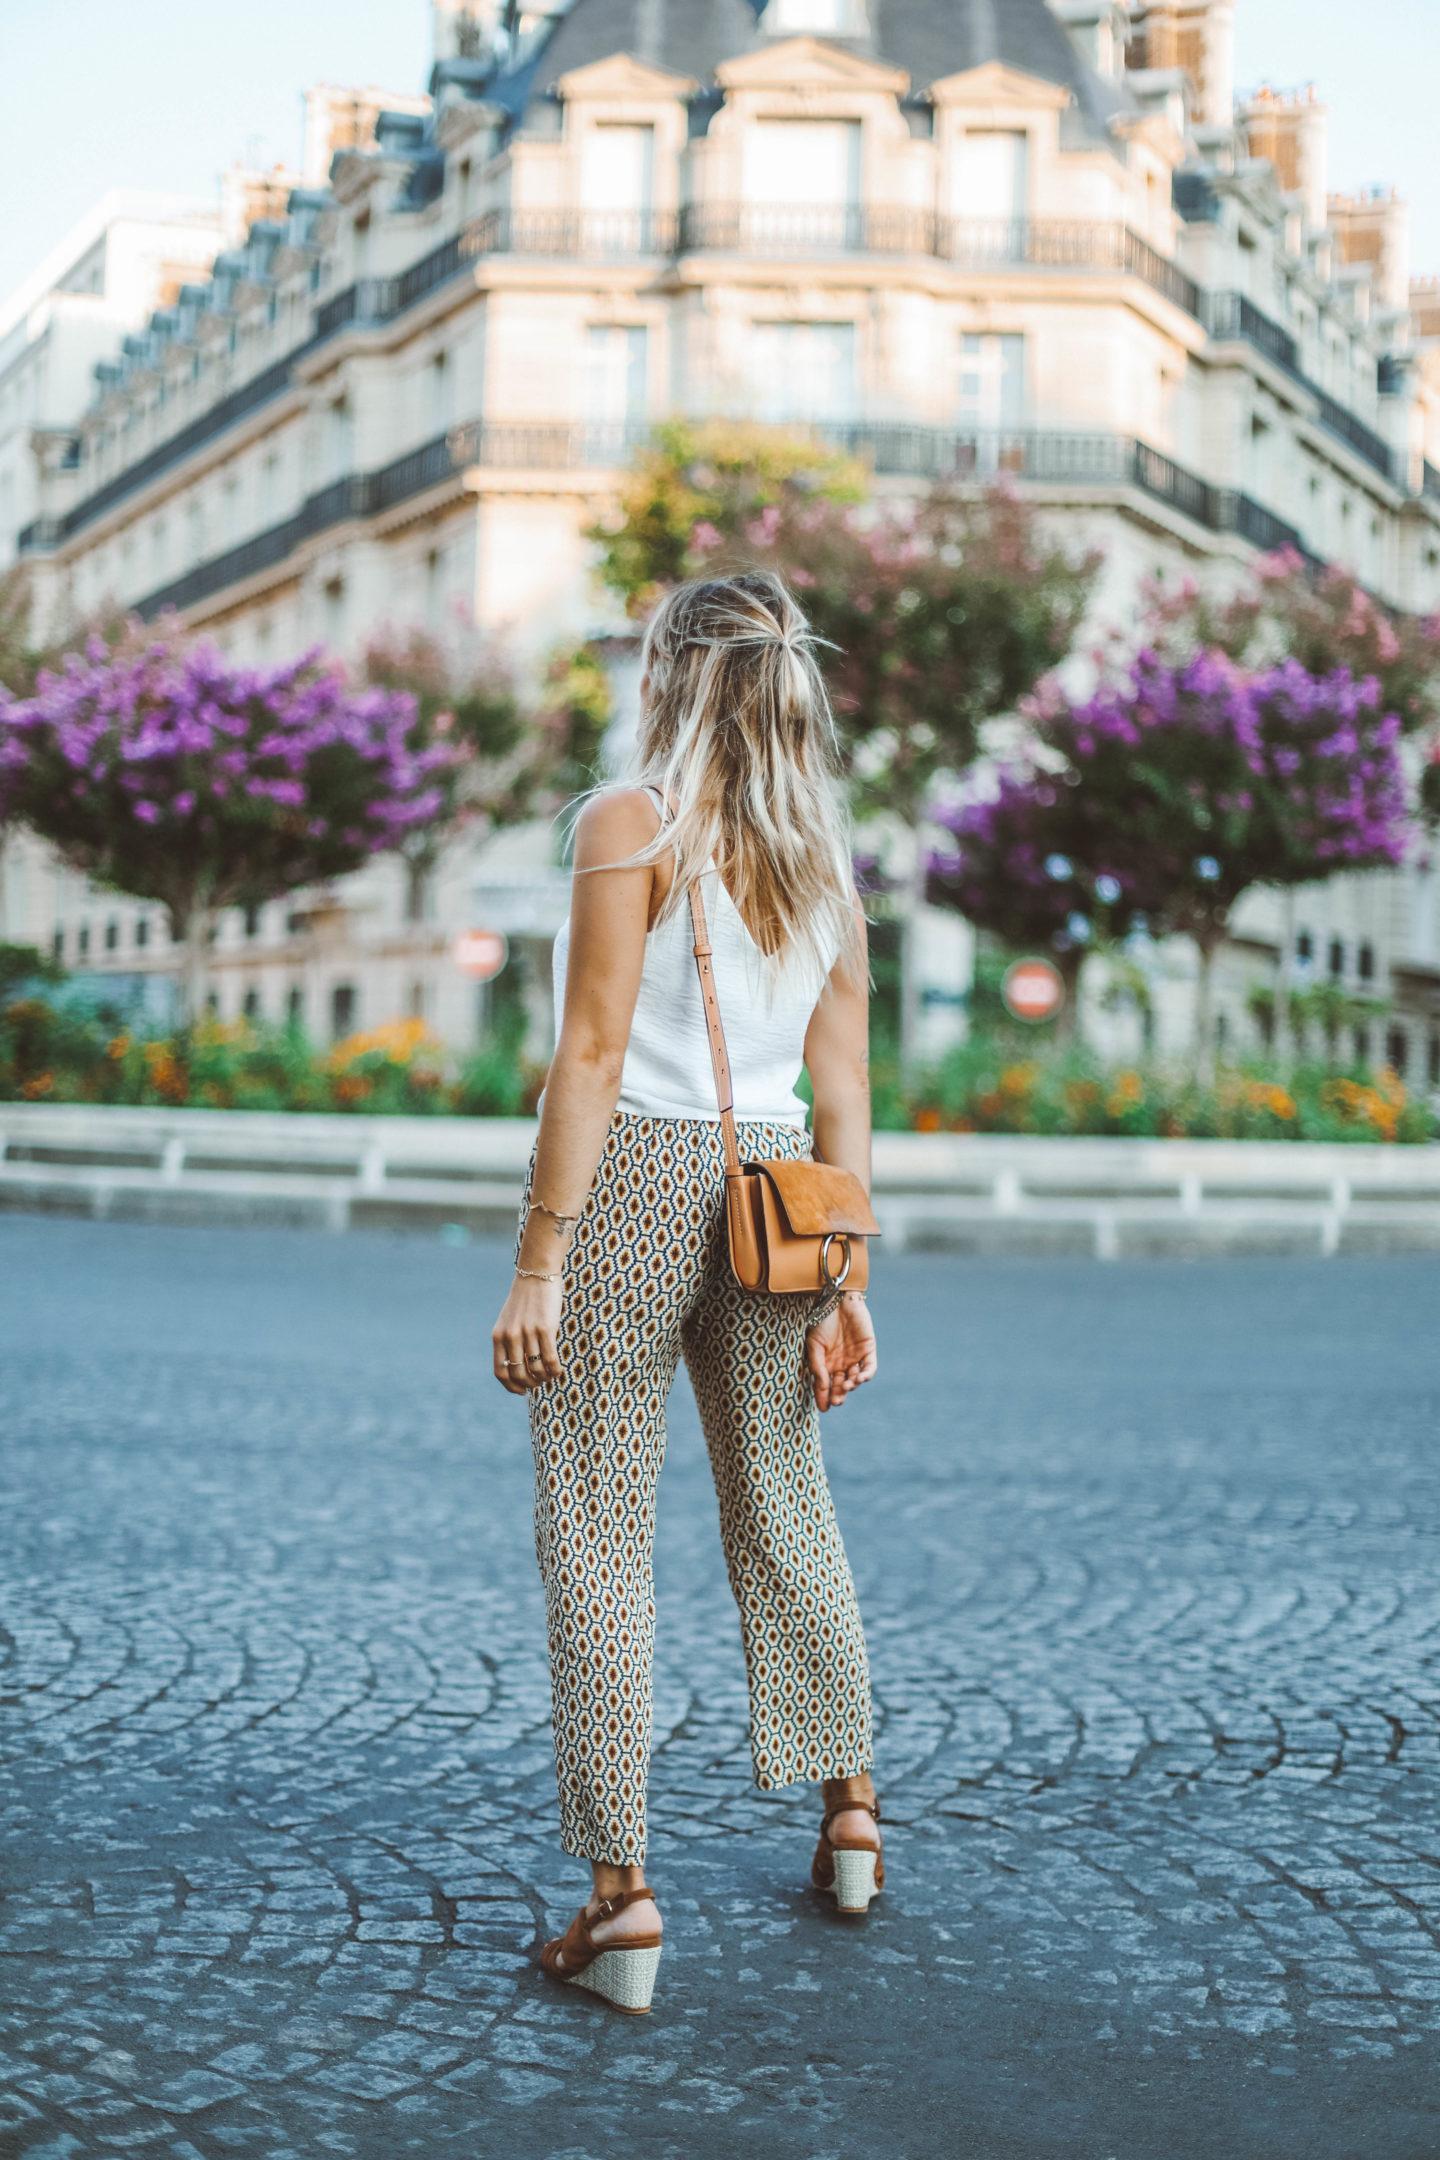 Espadrilles Balzac Paris - Blondie Baby blog mode Paris et voyages